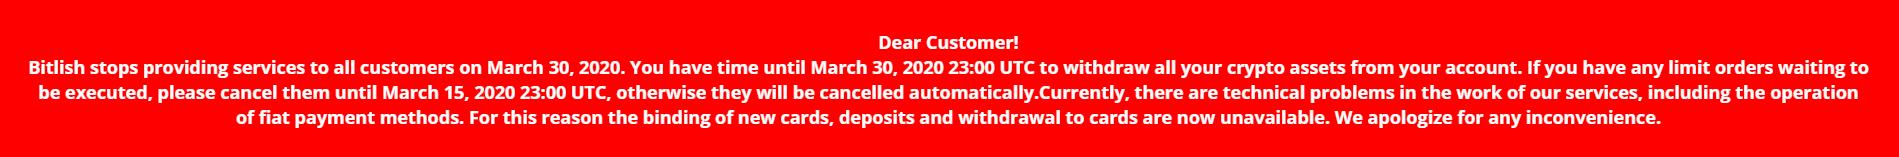 Bitlish Closing Message